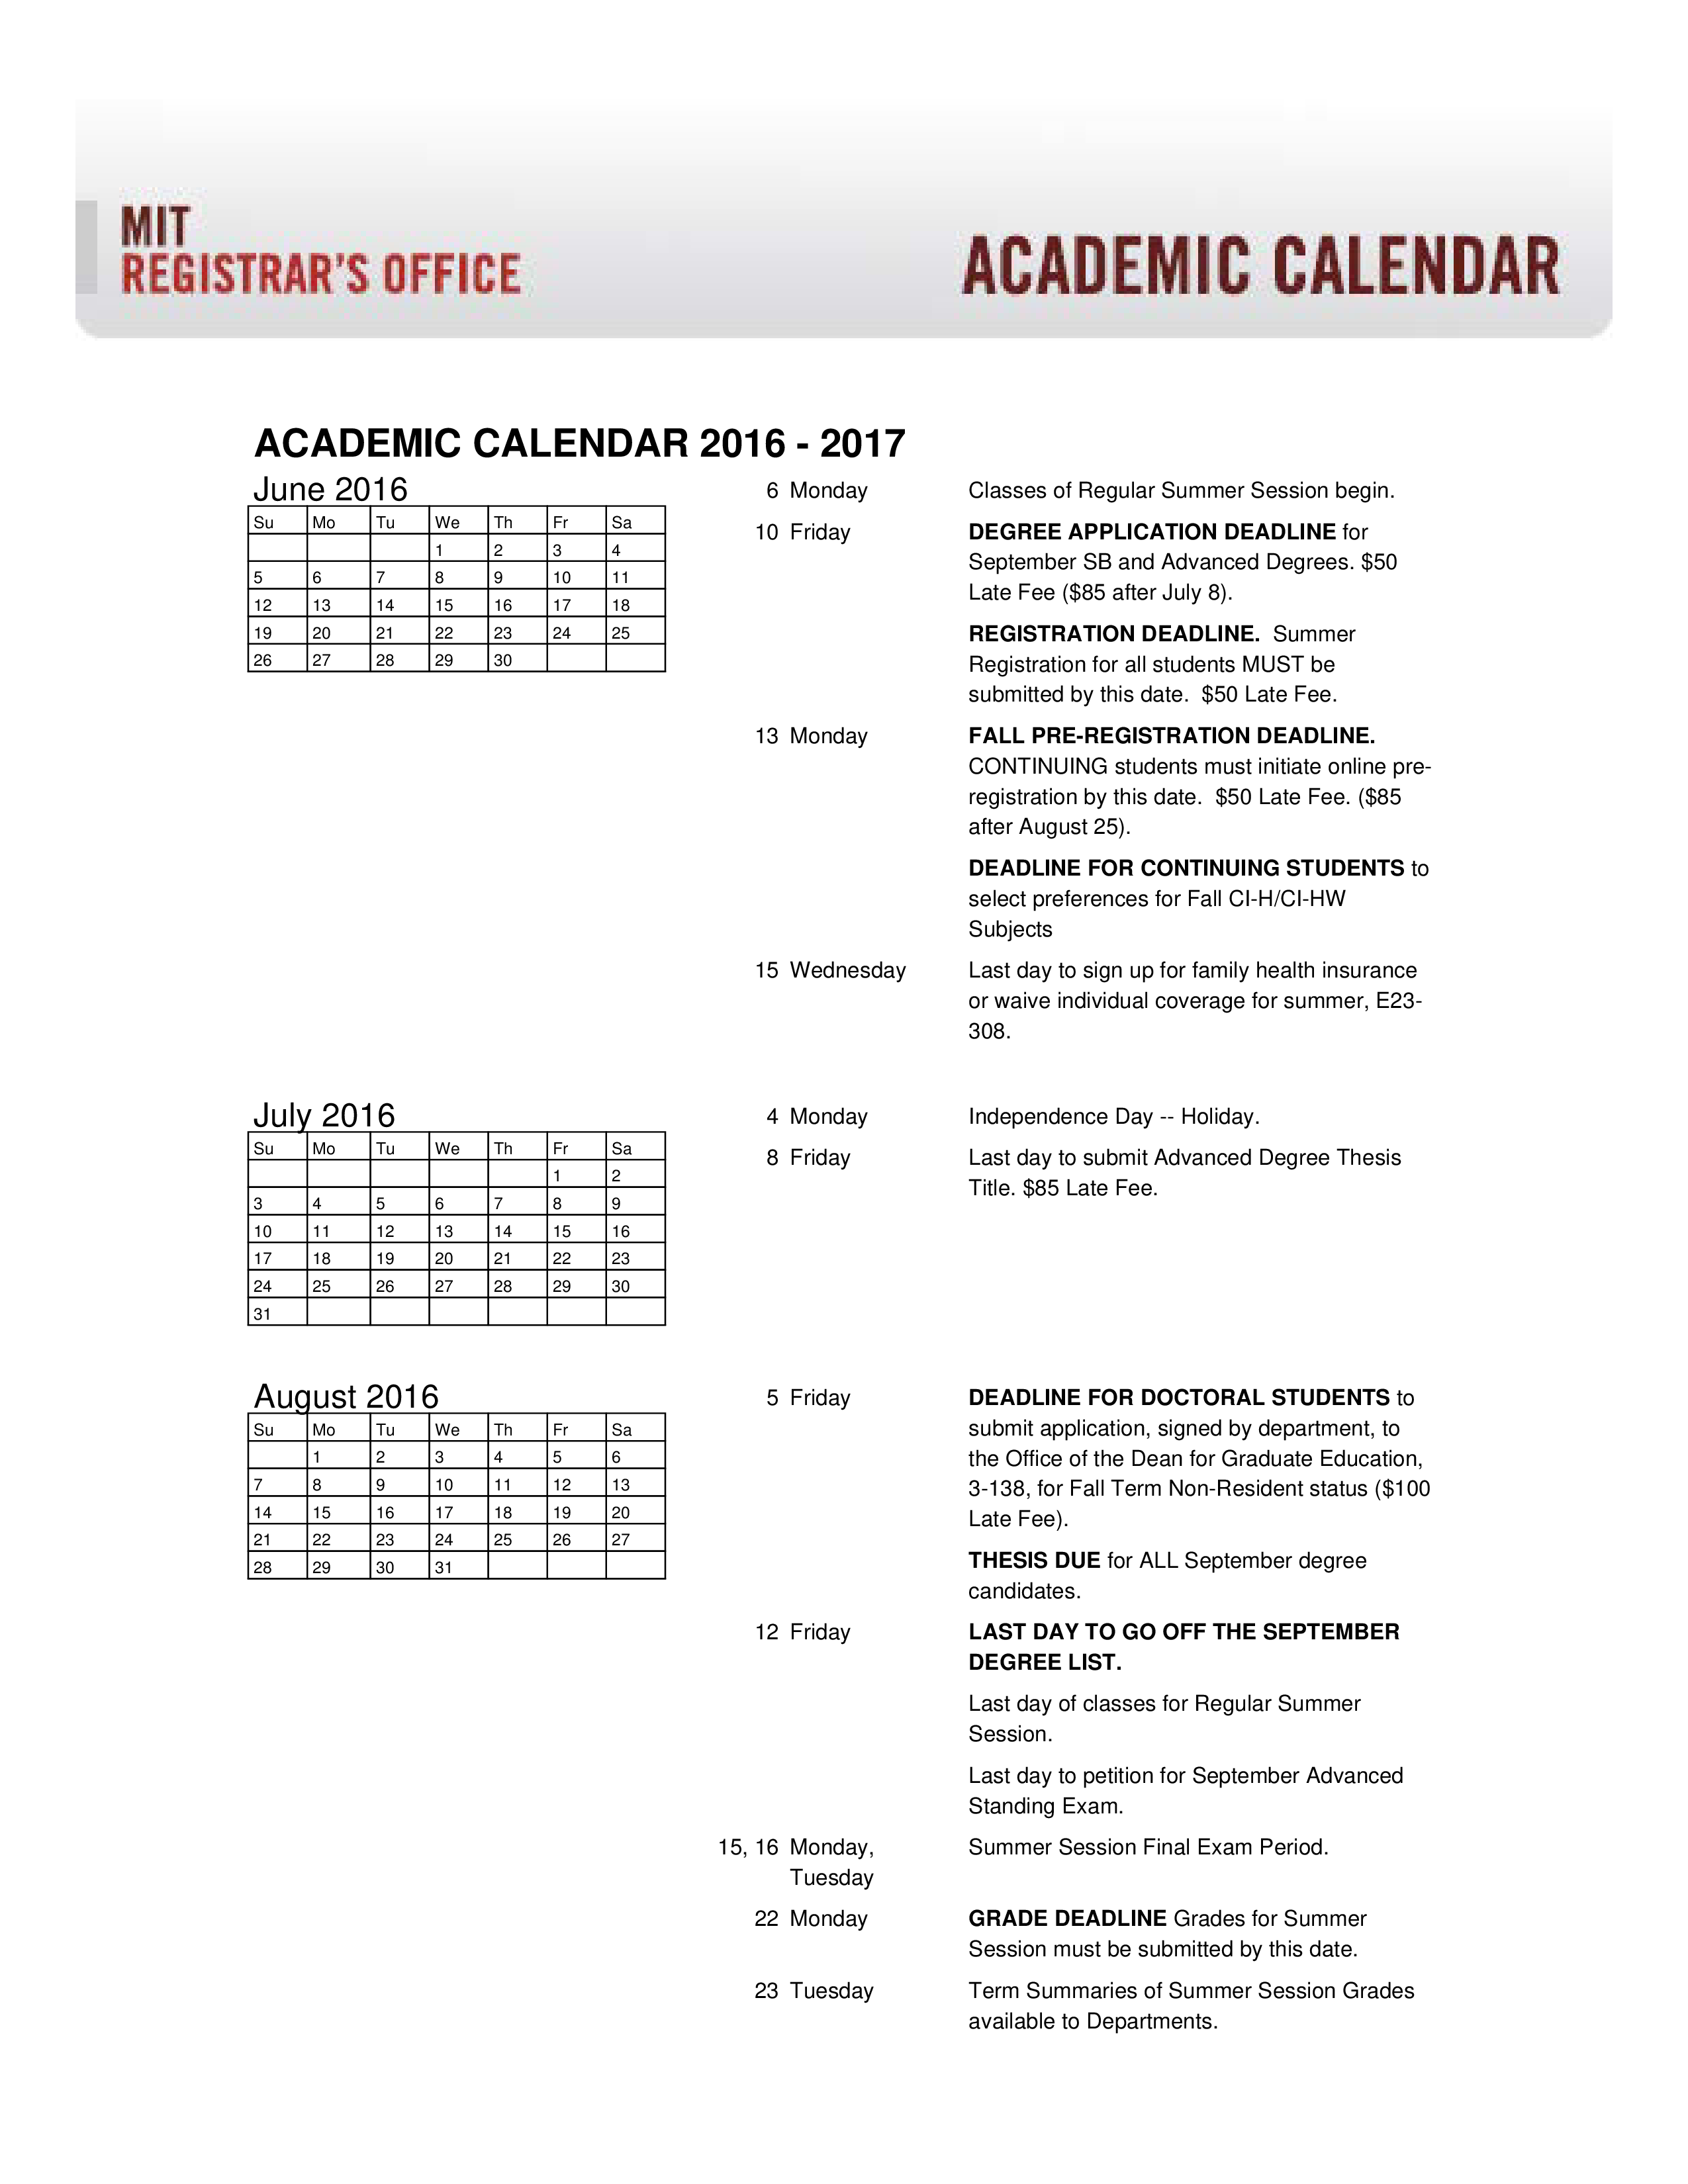 free academic college homework calendar templates at